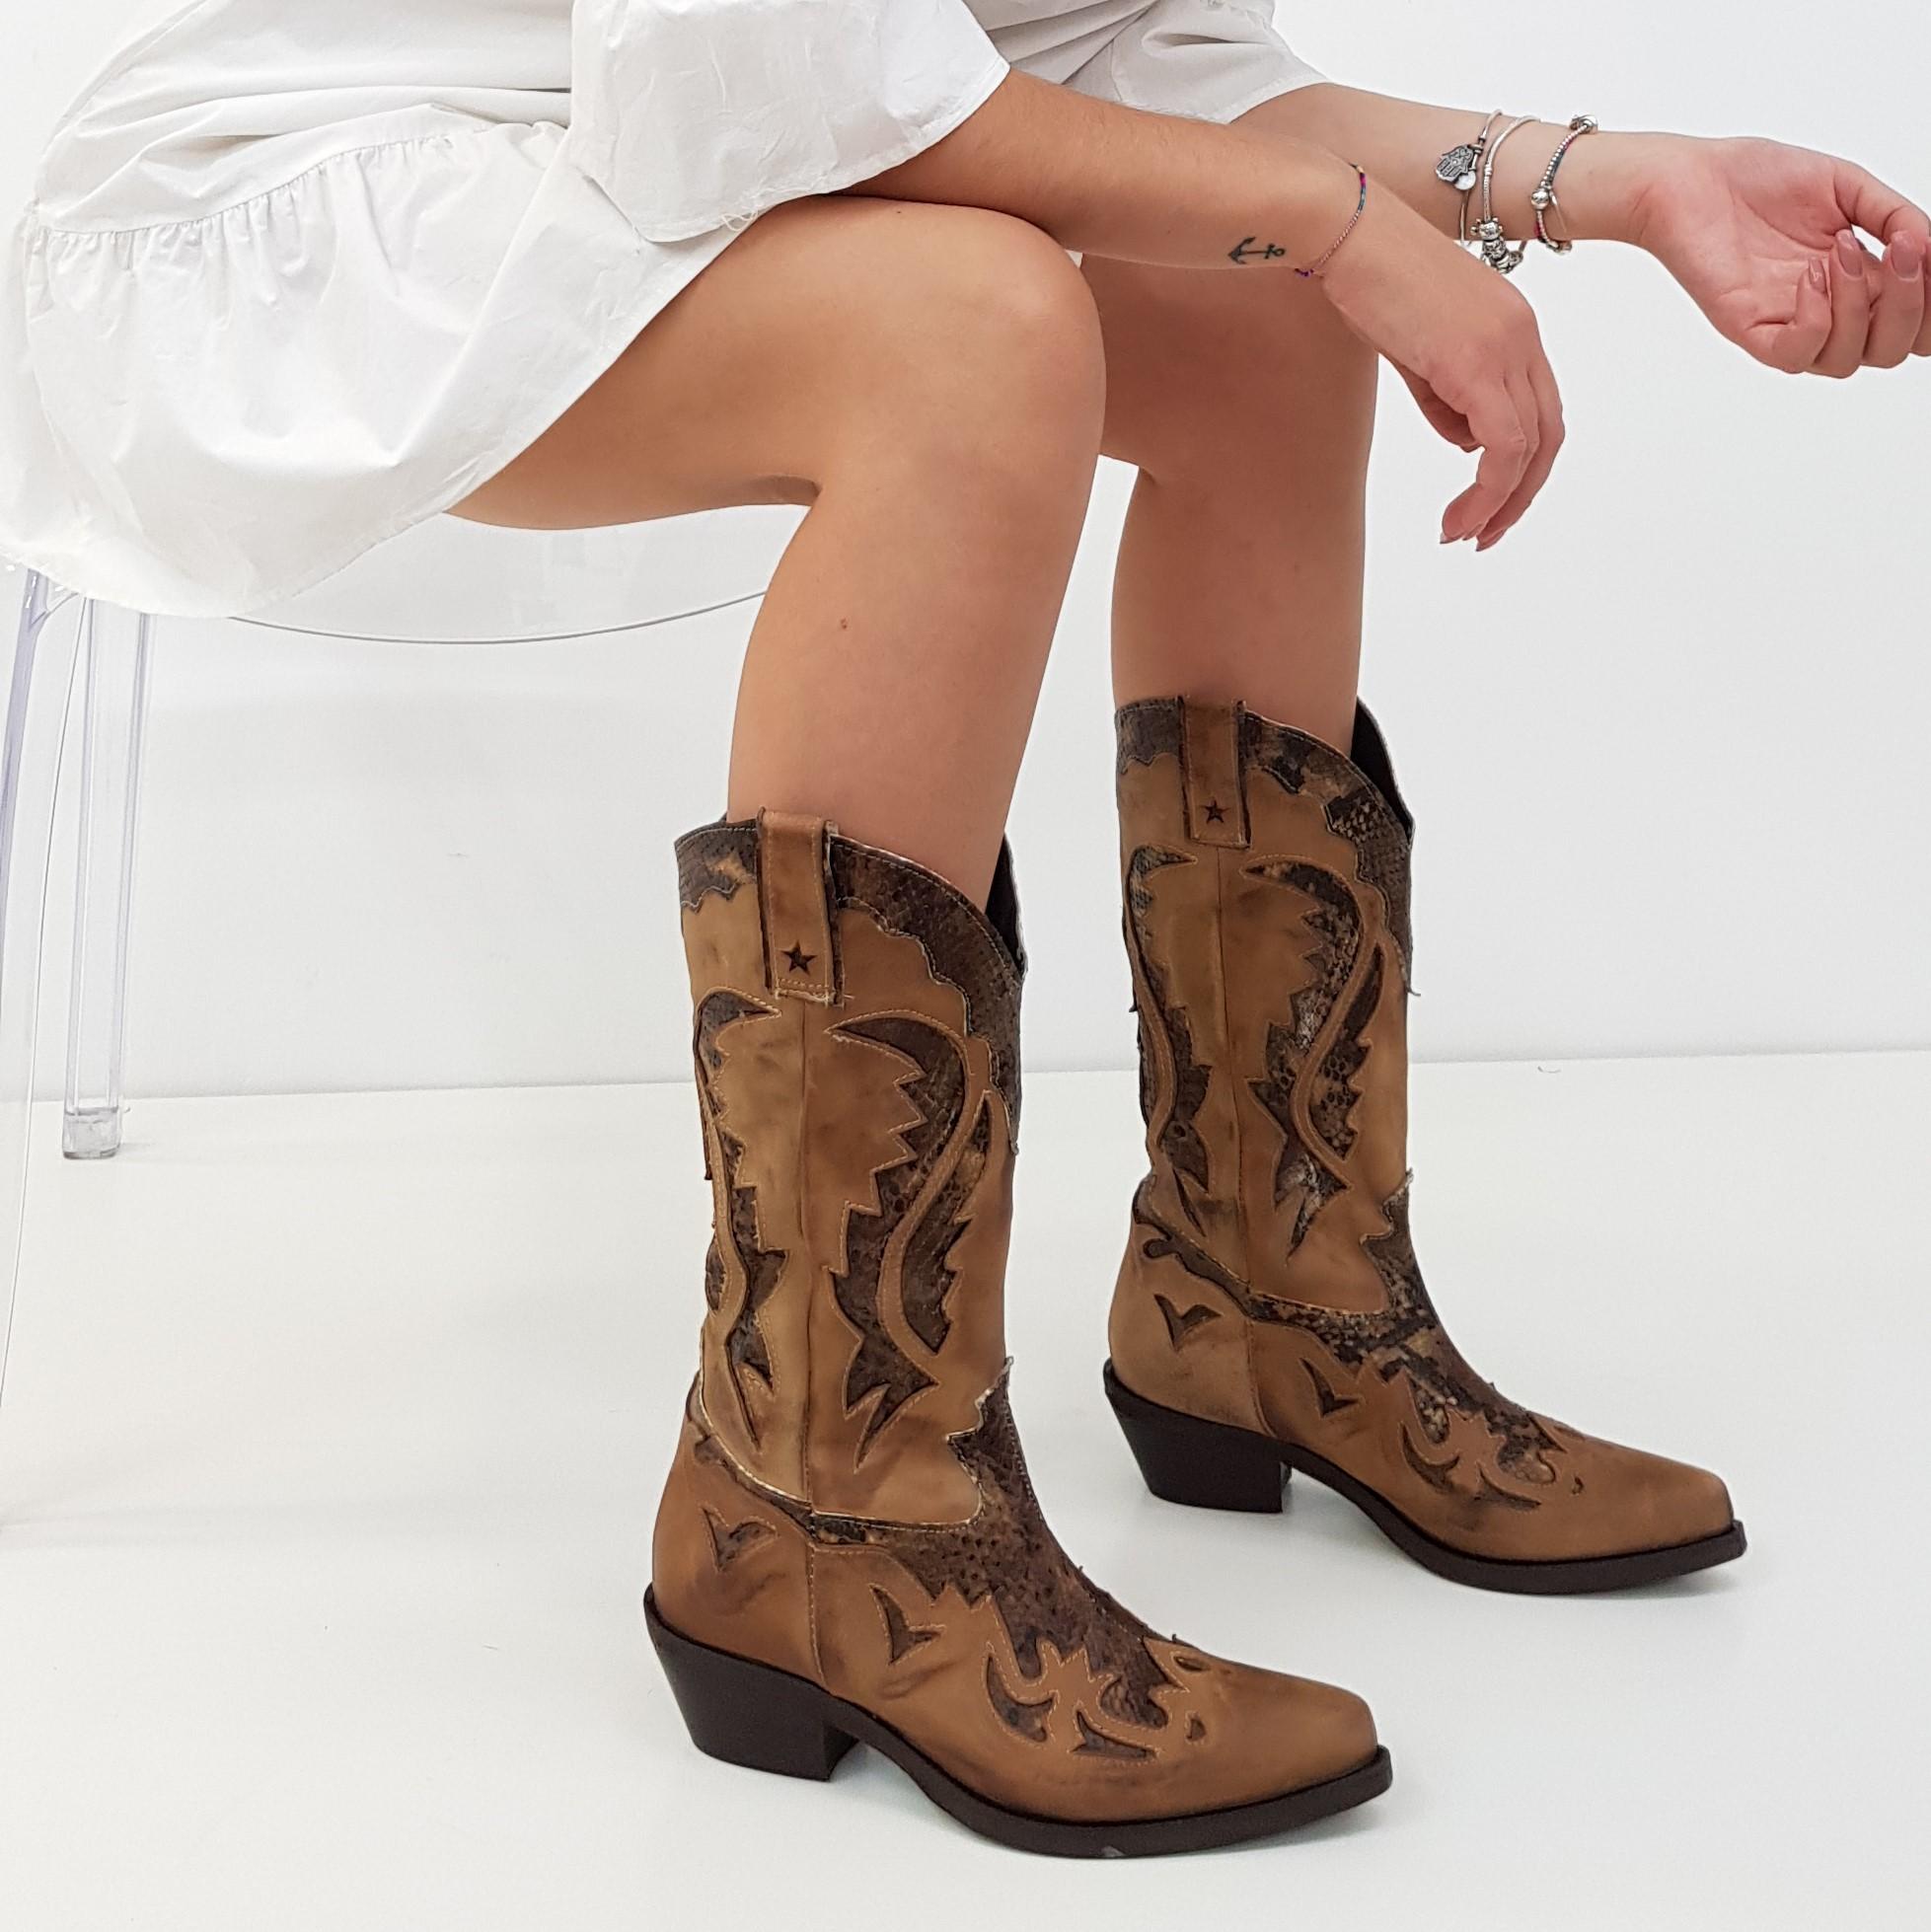 Stivali nabuk cuoio e anaconda oldwest1 - Lia diva scarpe ...